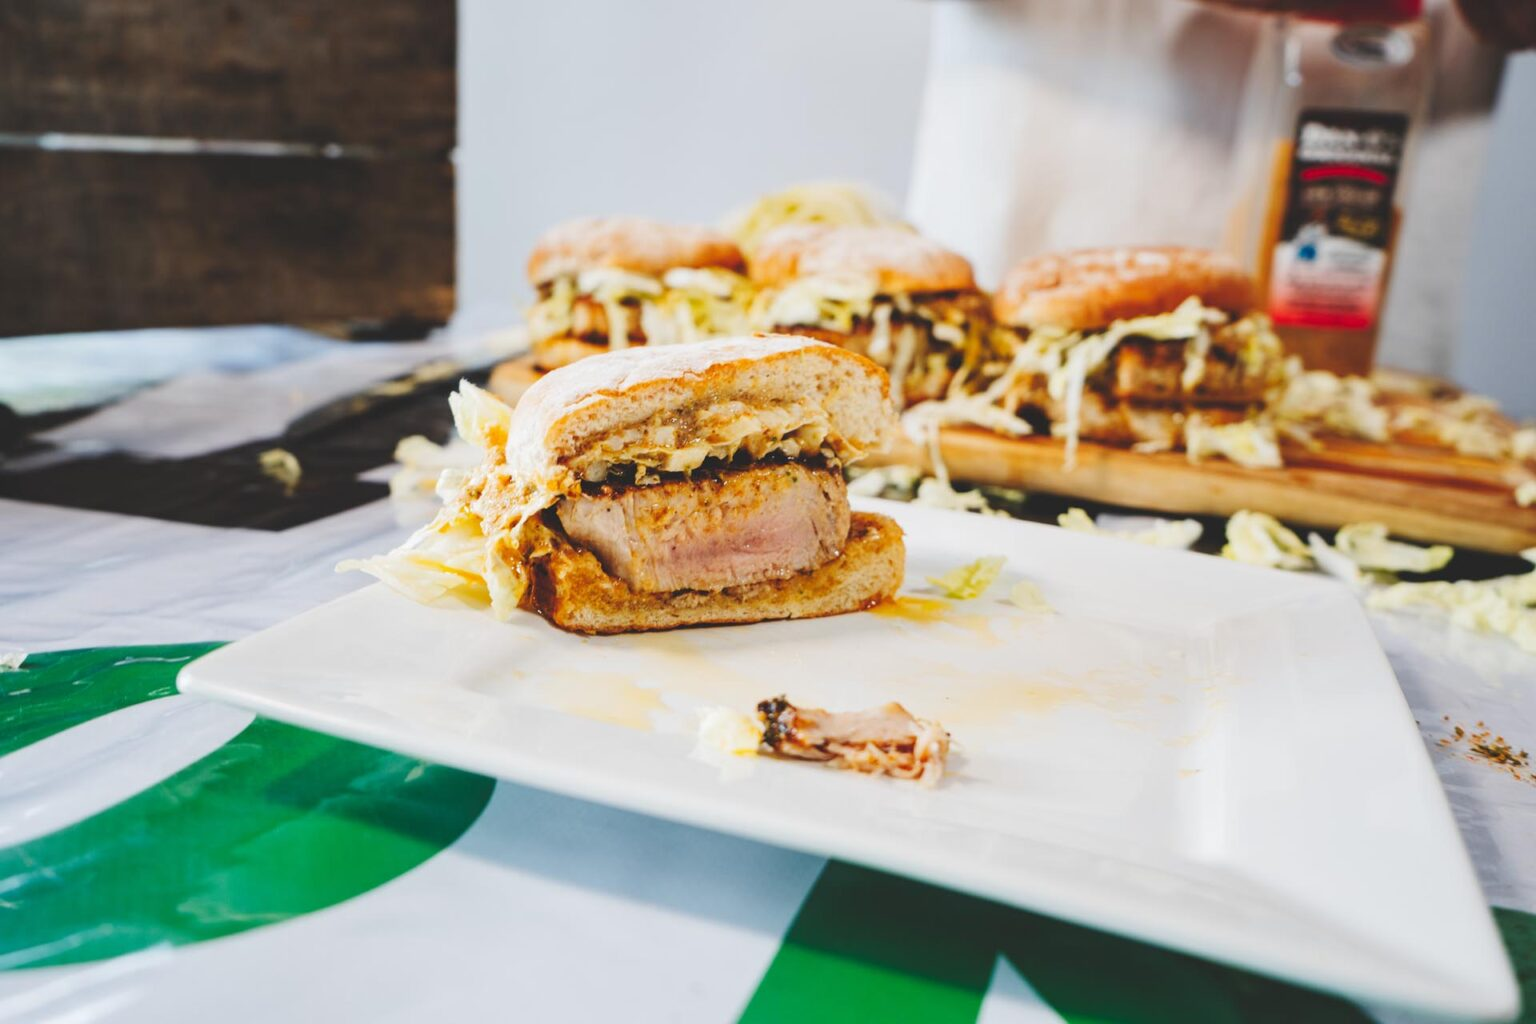 Image of Tuna Steak Sandwich on plate